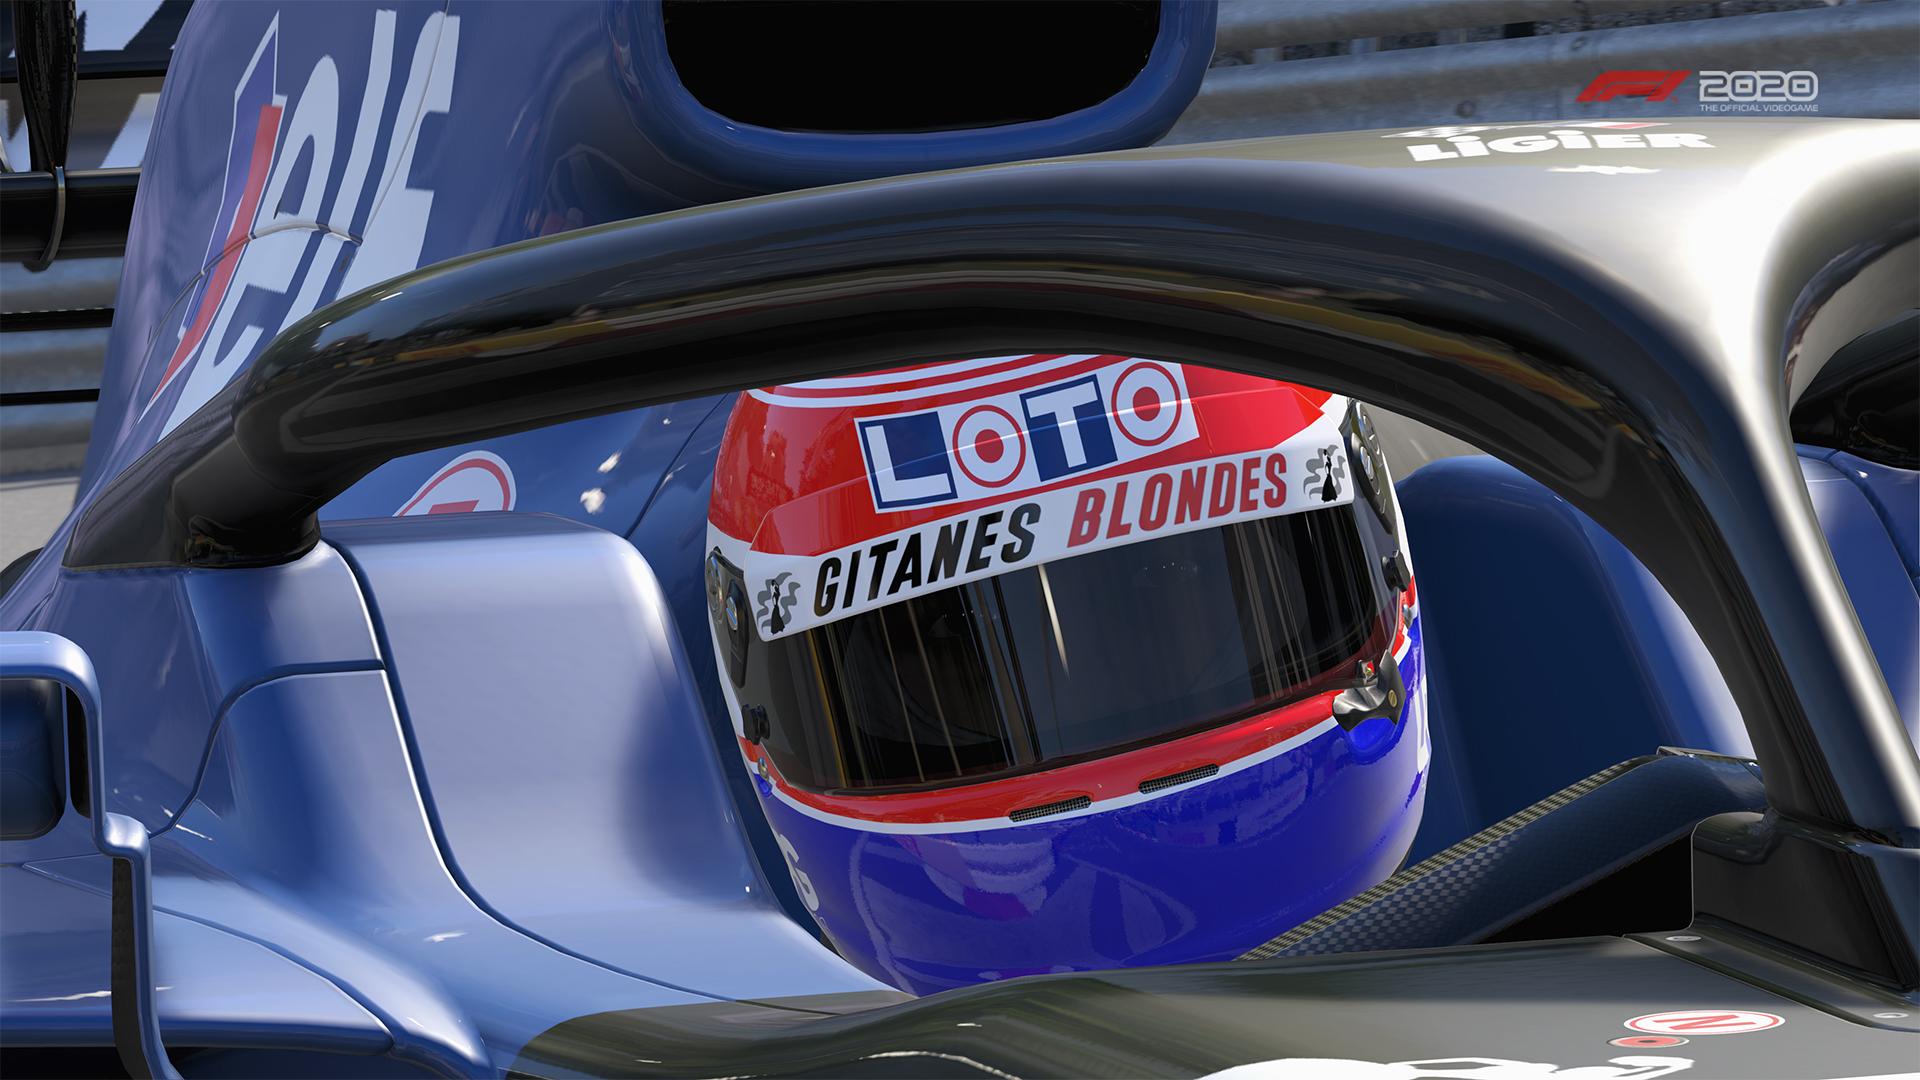 F1_2020_photo_20210327_044808.jpg